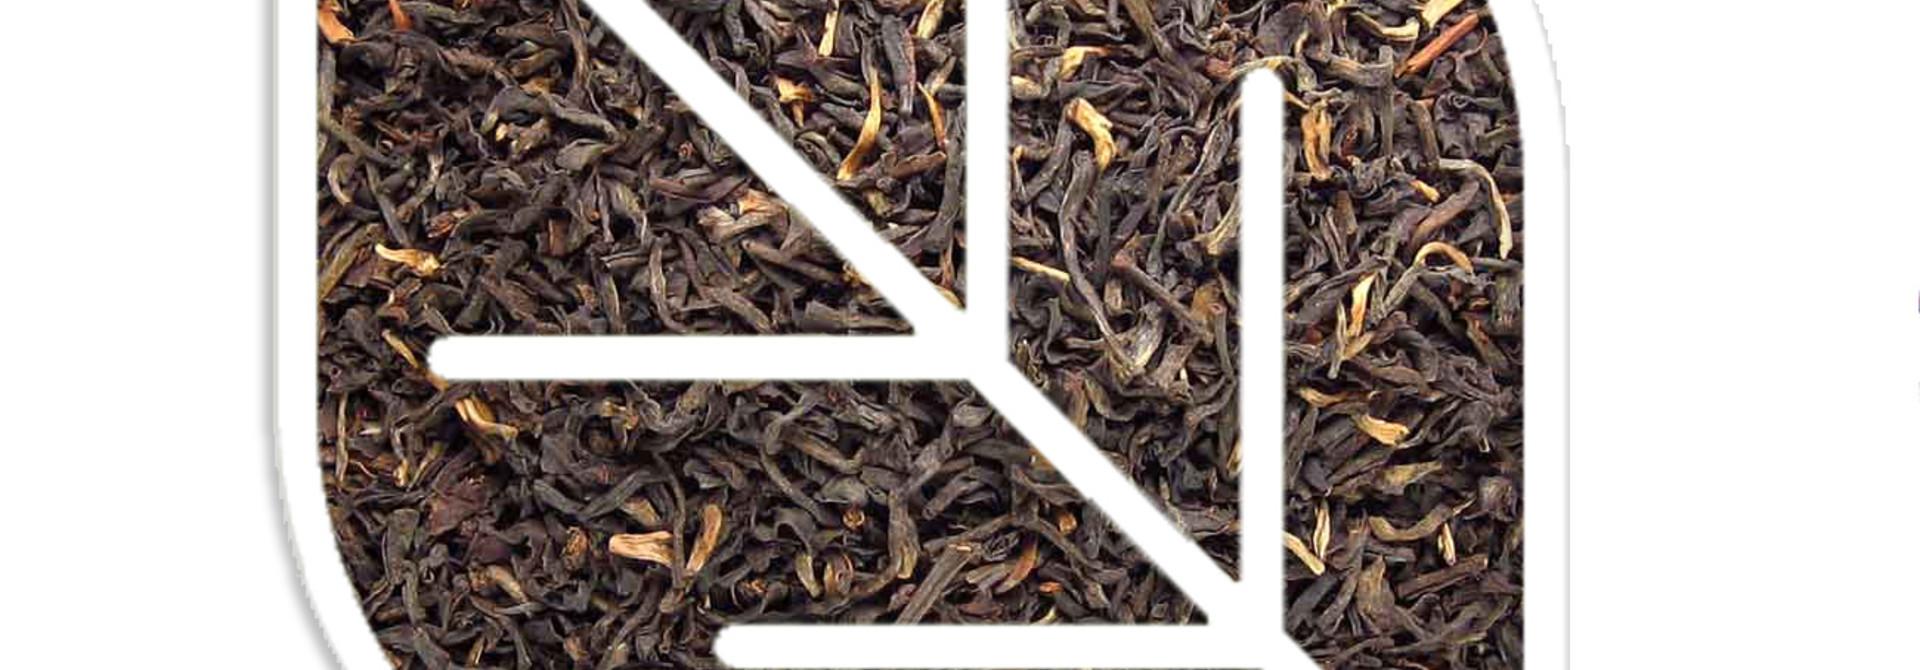 Oostfriesen Melange Blad thee 1